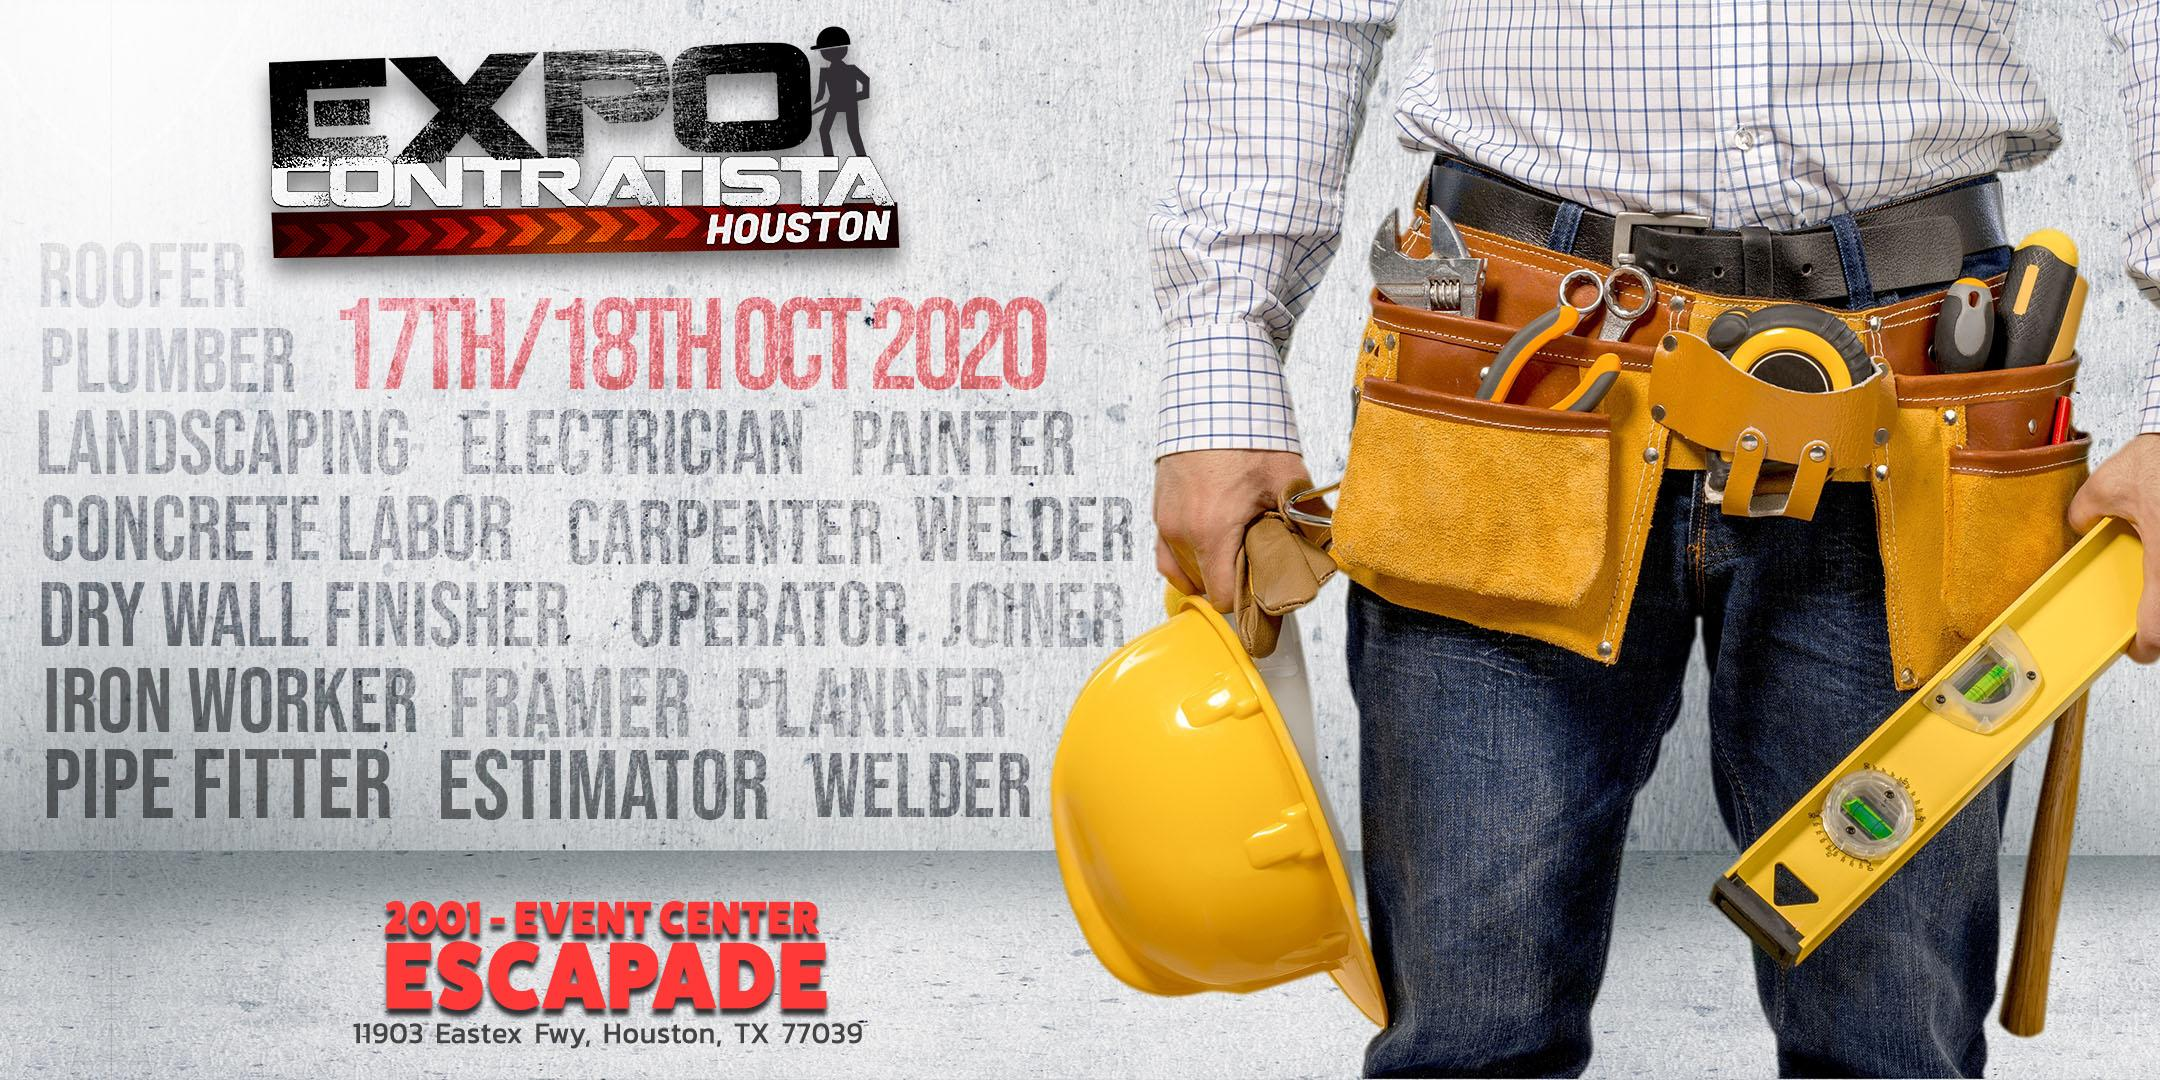 ExpoContratista Houston 2020